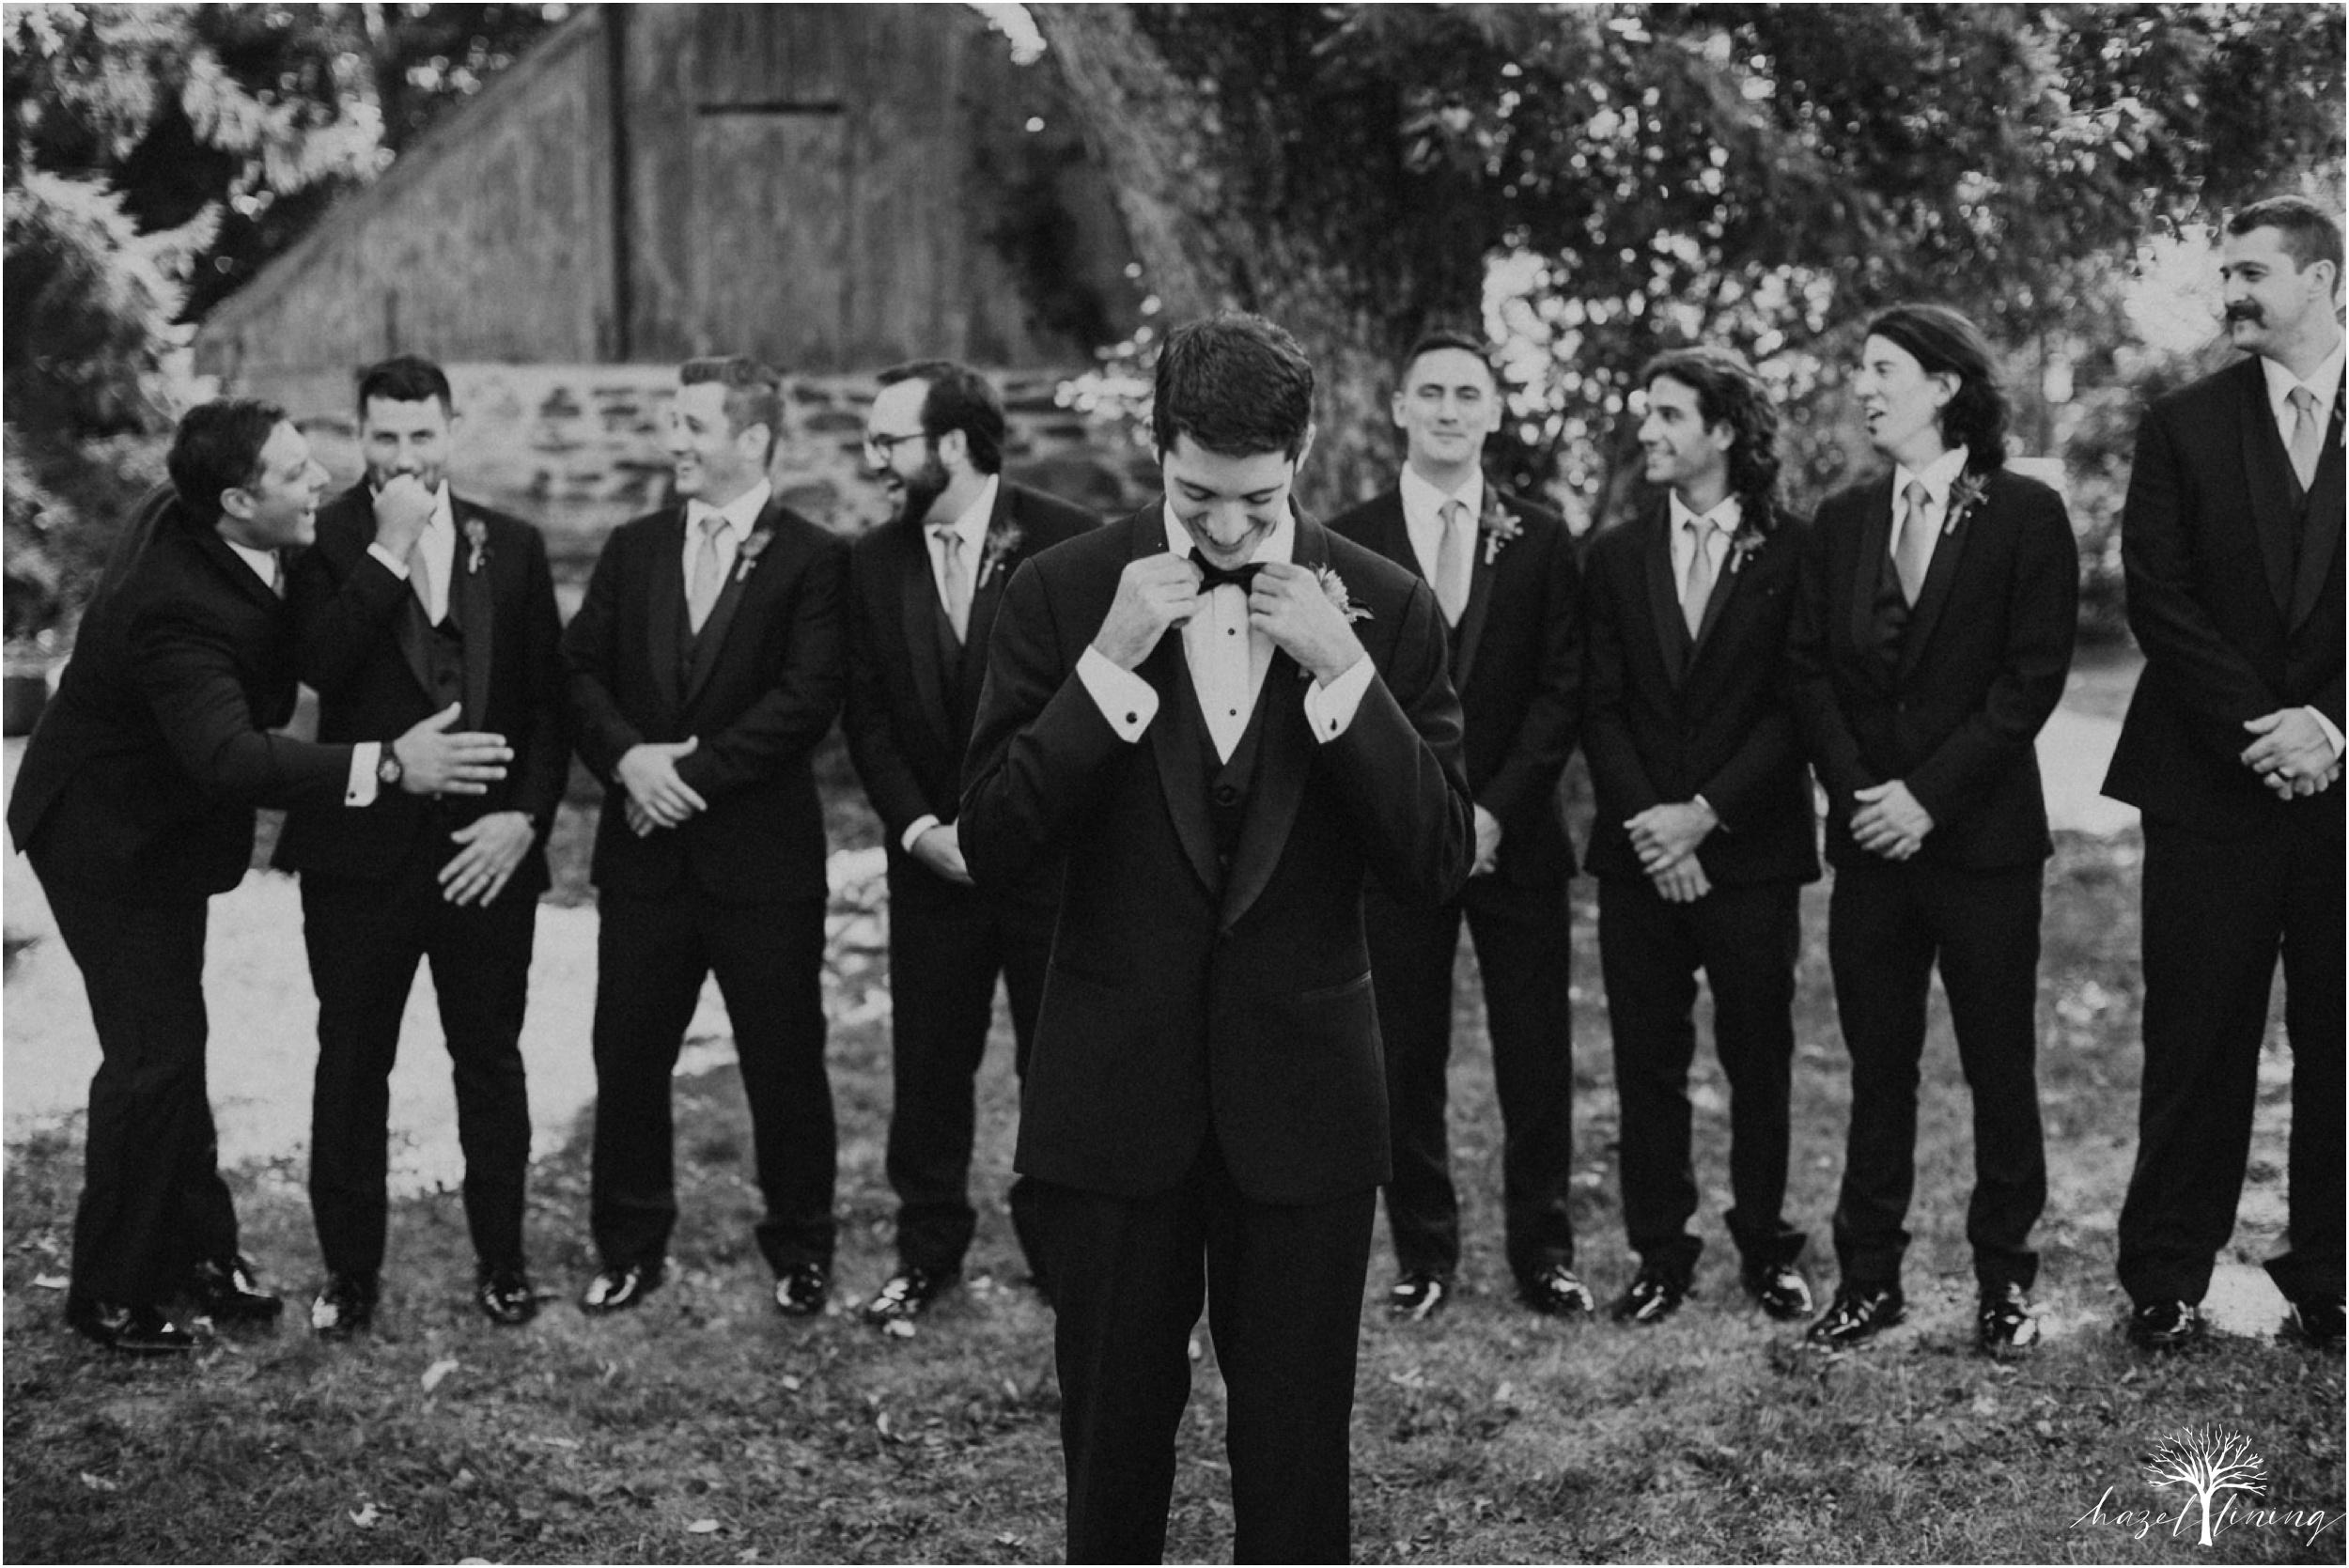 maureen-hepner-anthony-giordano-rose-bank-winery-newtow-pennsylvania-luxury-summer-wedding-hazel-lining-photography-destination-elopement-wedding-engagement-photography_0056-2.jpg